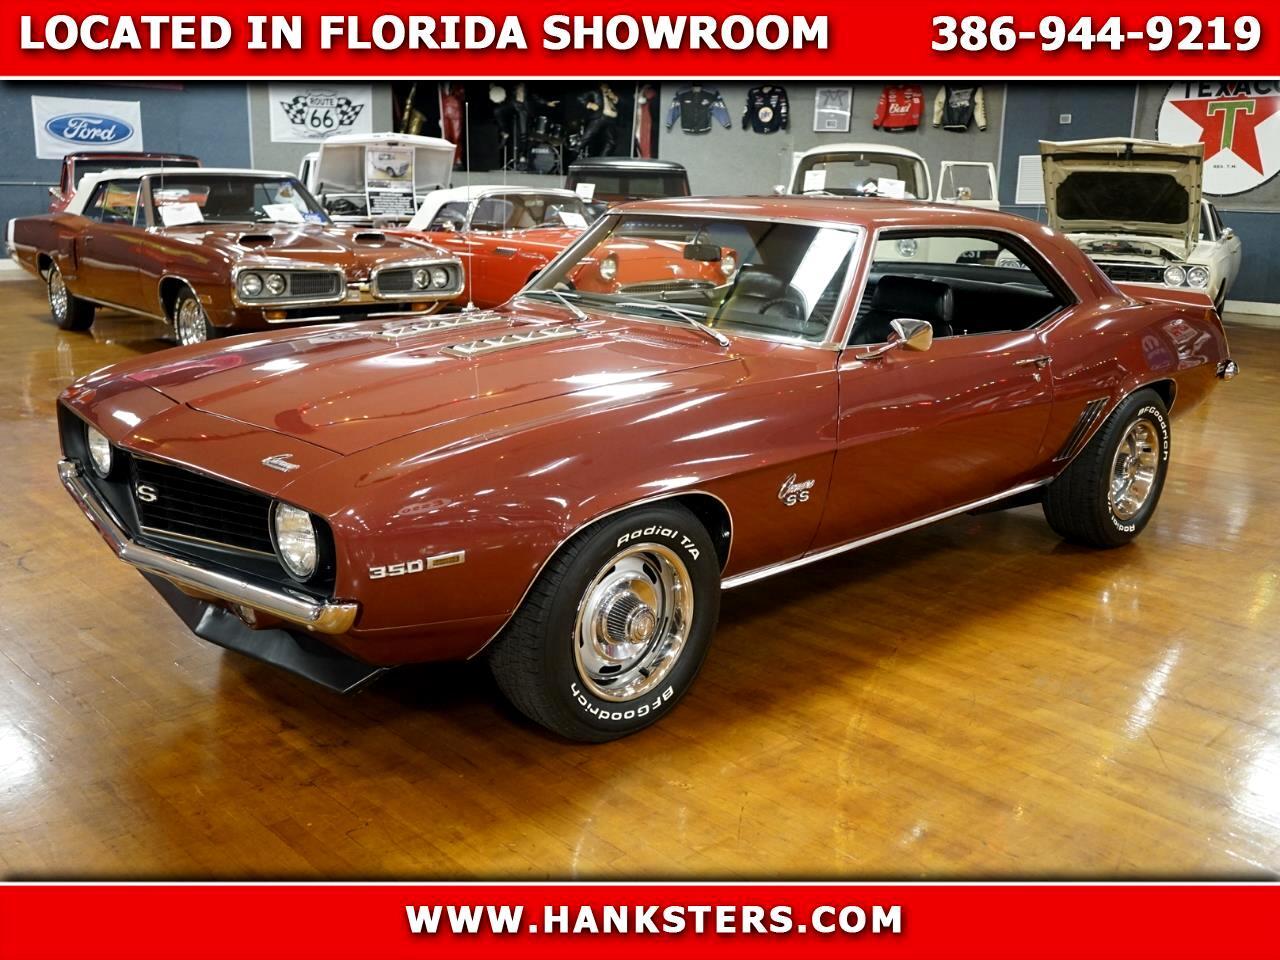 1969 Chevrolet Camaro SS Style